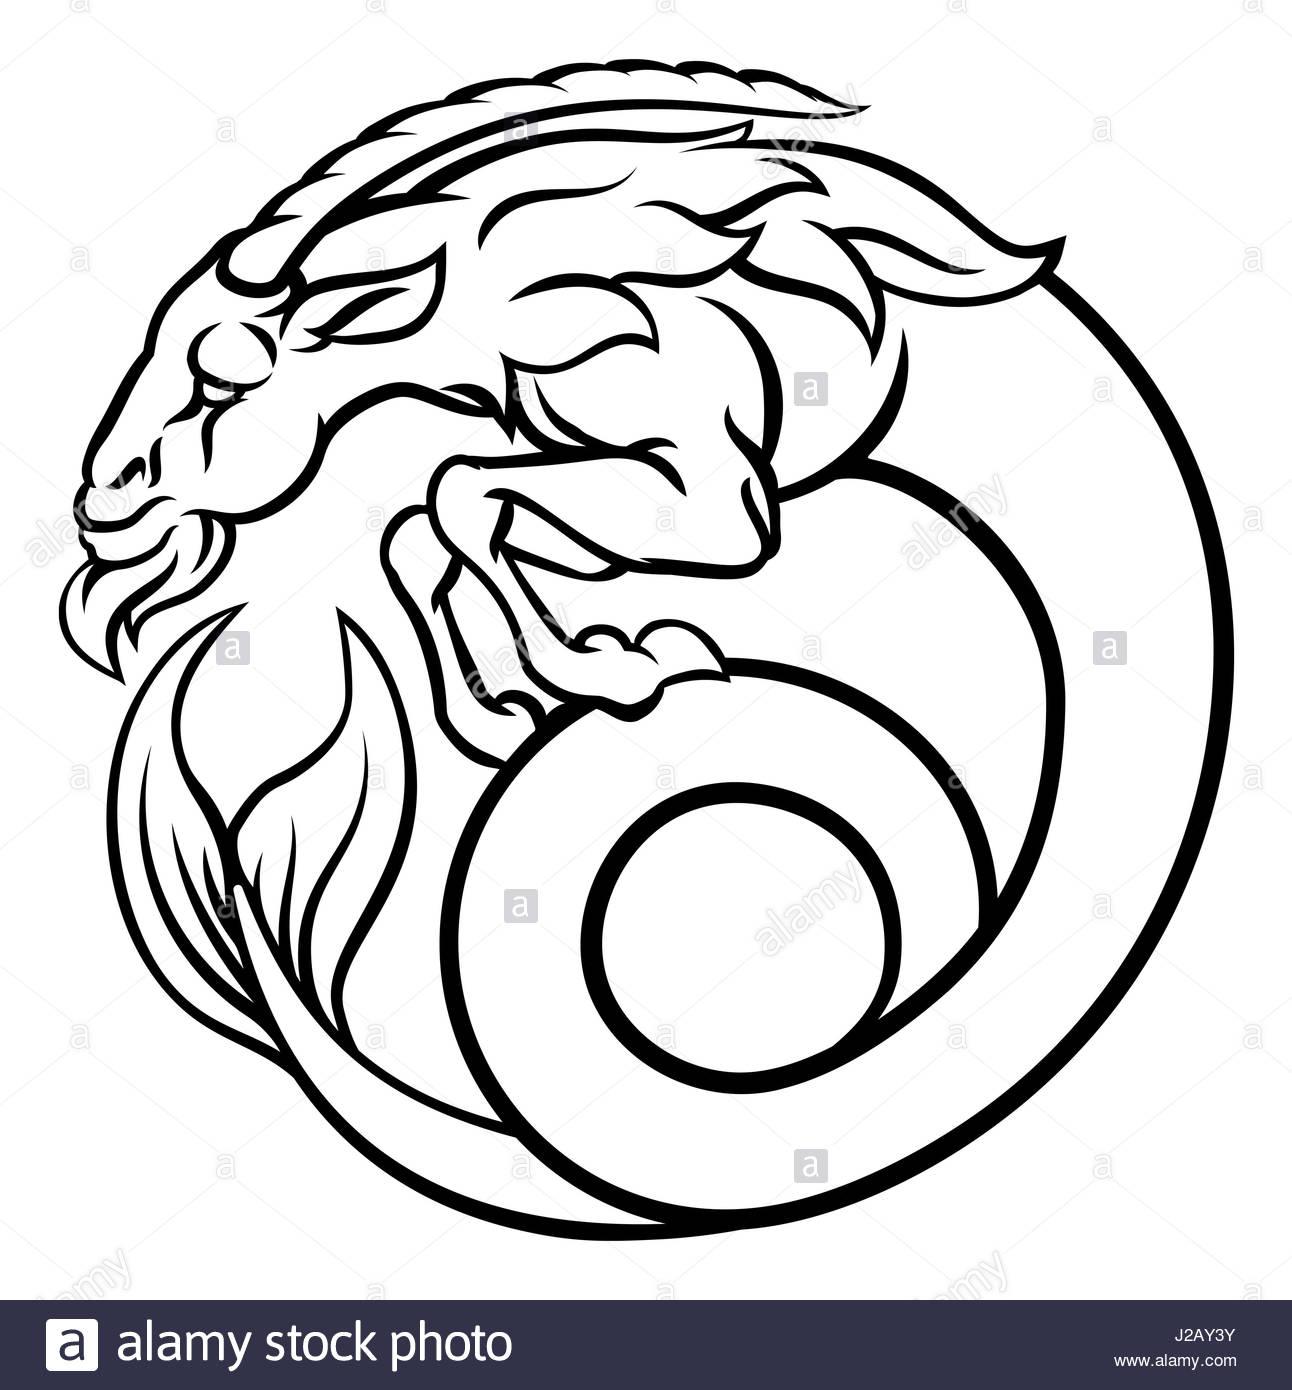 1292x1390 Astrology Zodiac Signs Circular Capricorn Sea Goat Horoscope